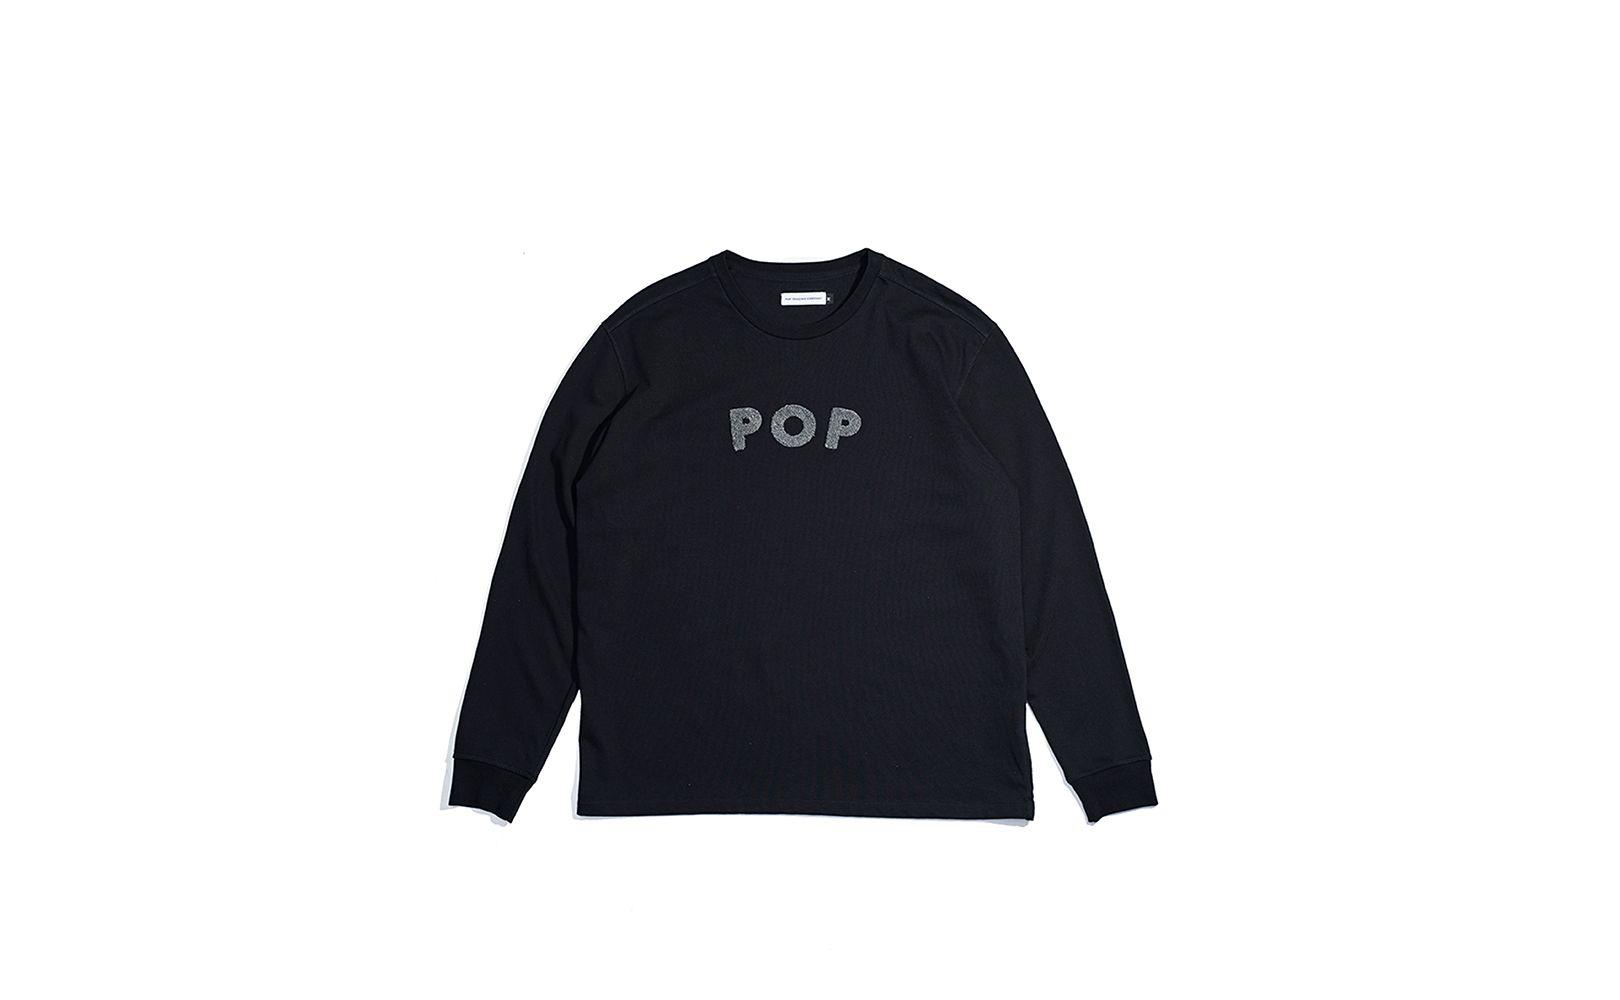 pop-trading-company-aw17-product-uni-longsleeve-black